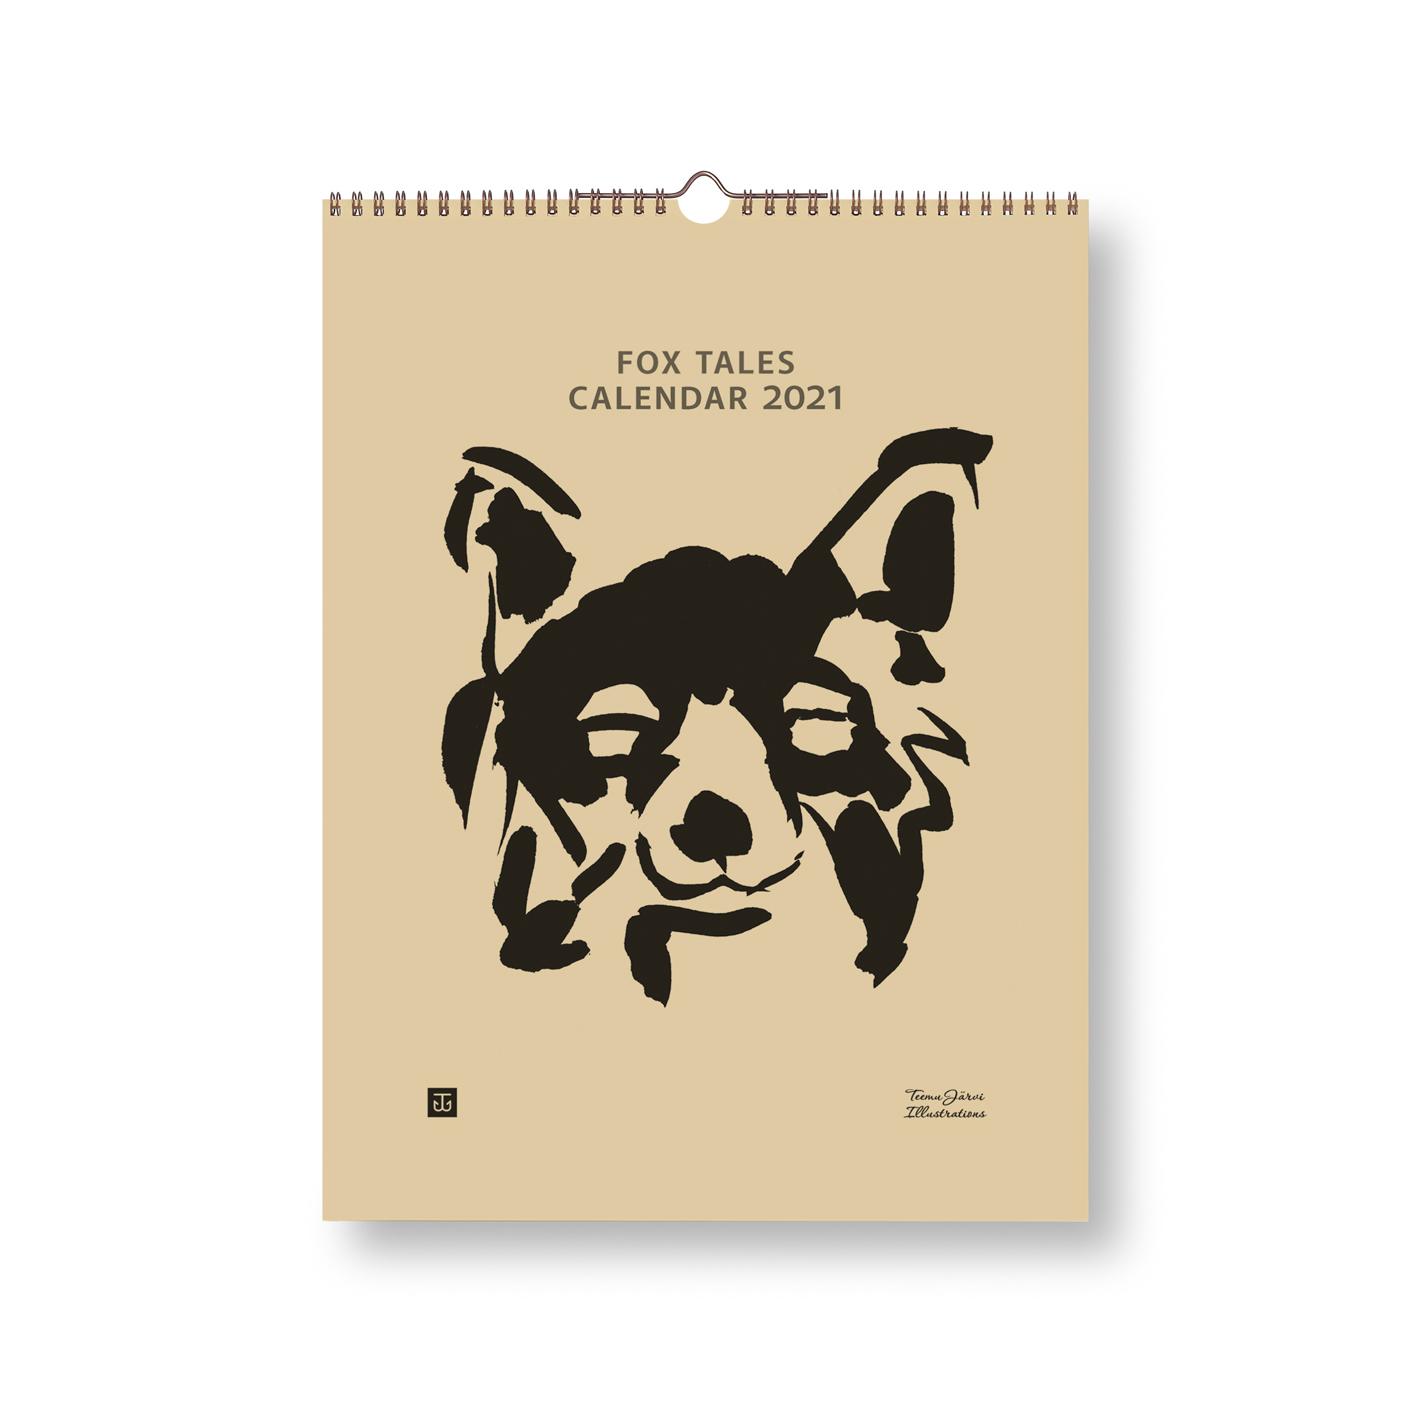 Fox Tales calendar